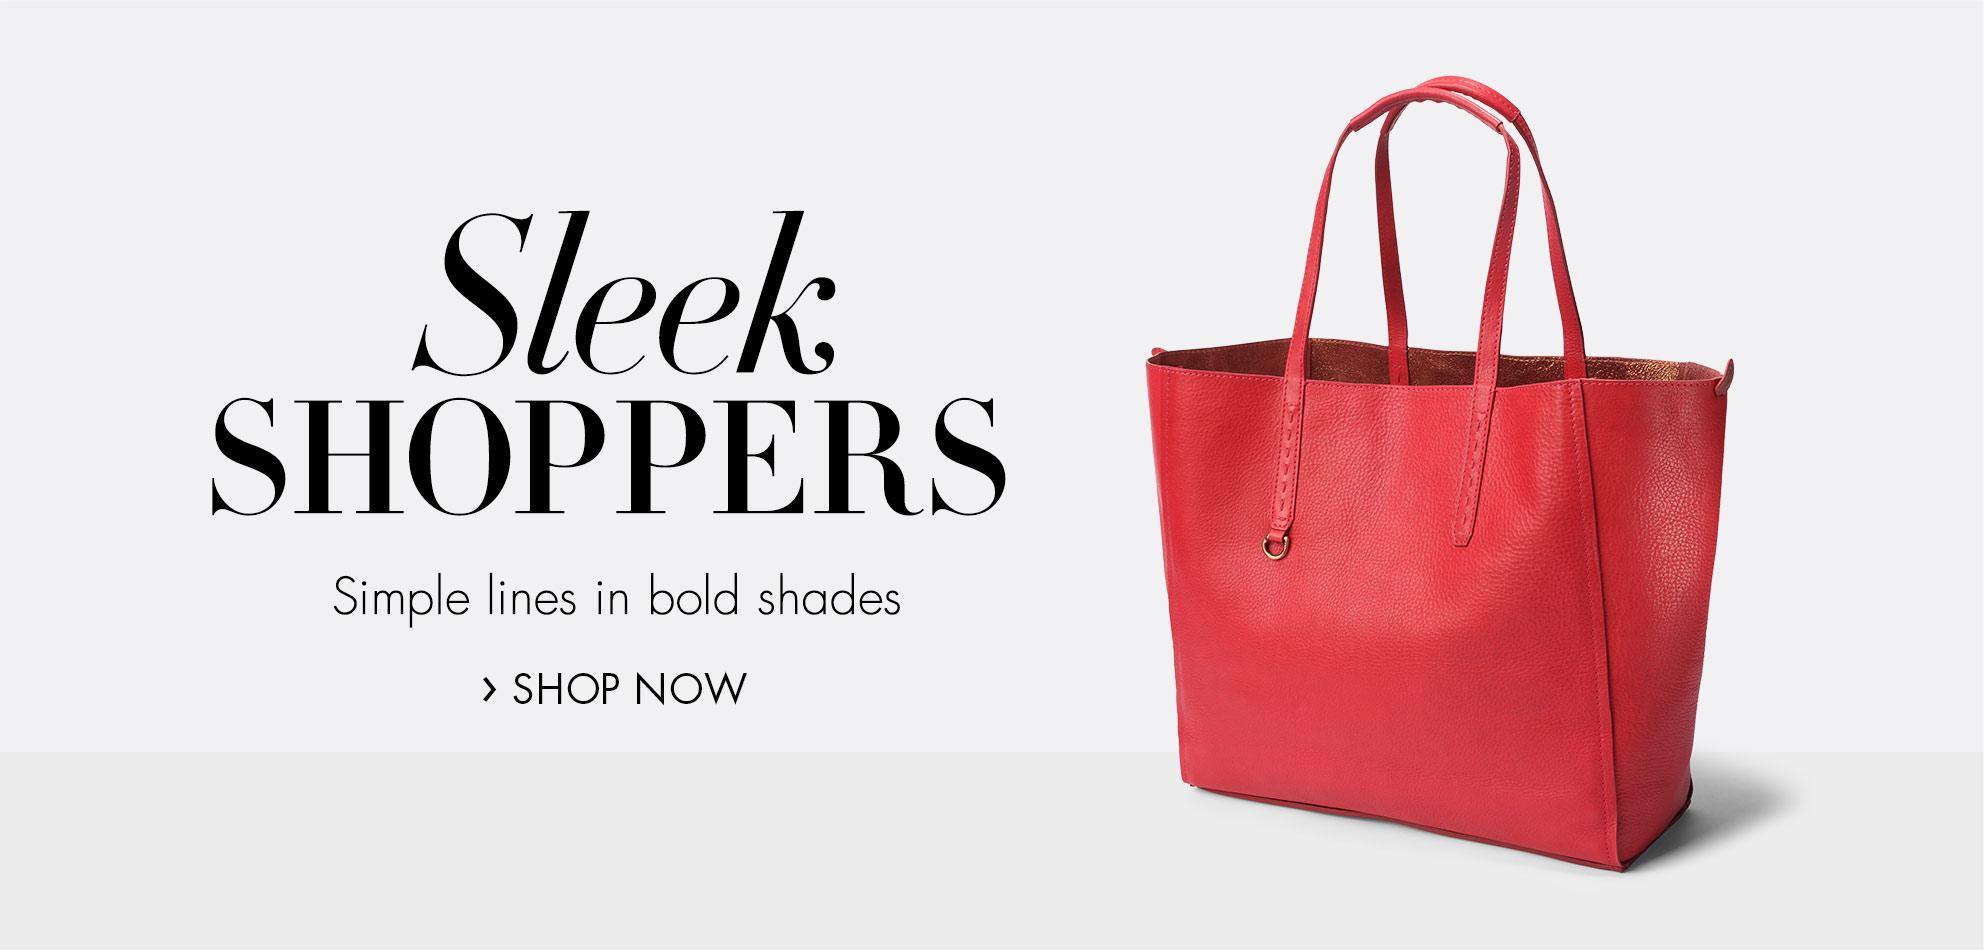 Sleek Shoppers